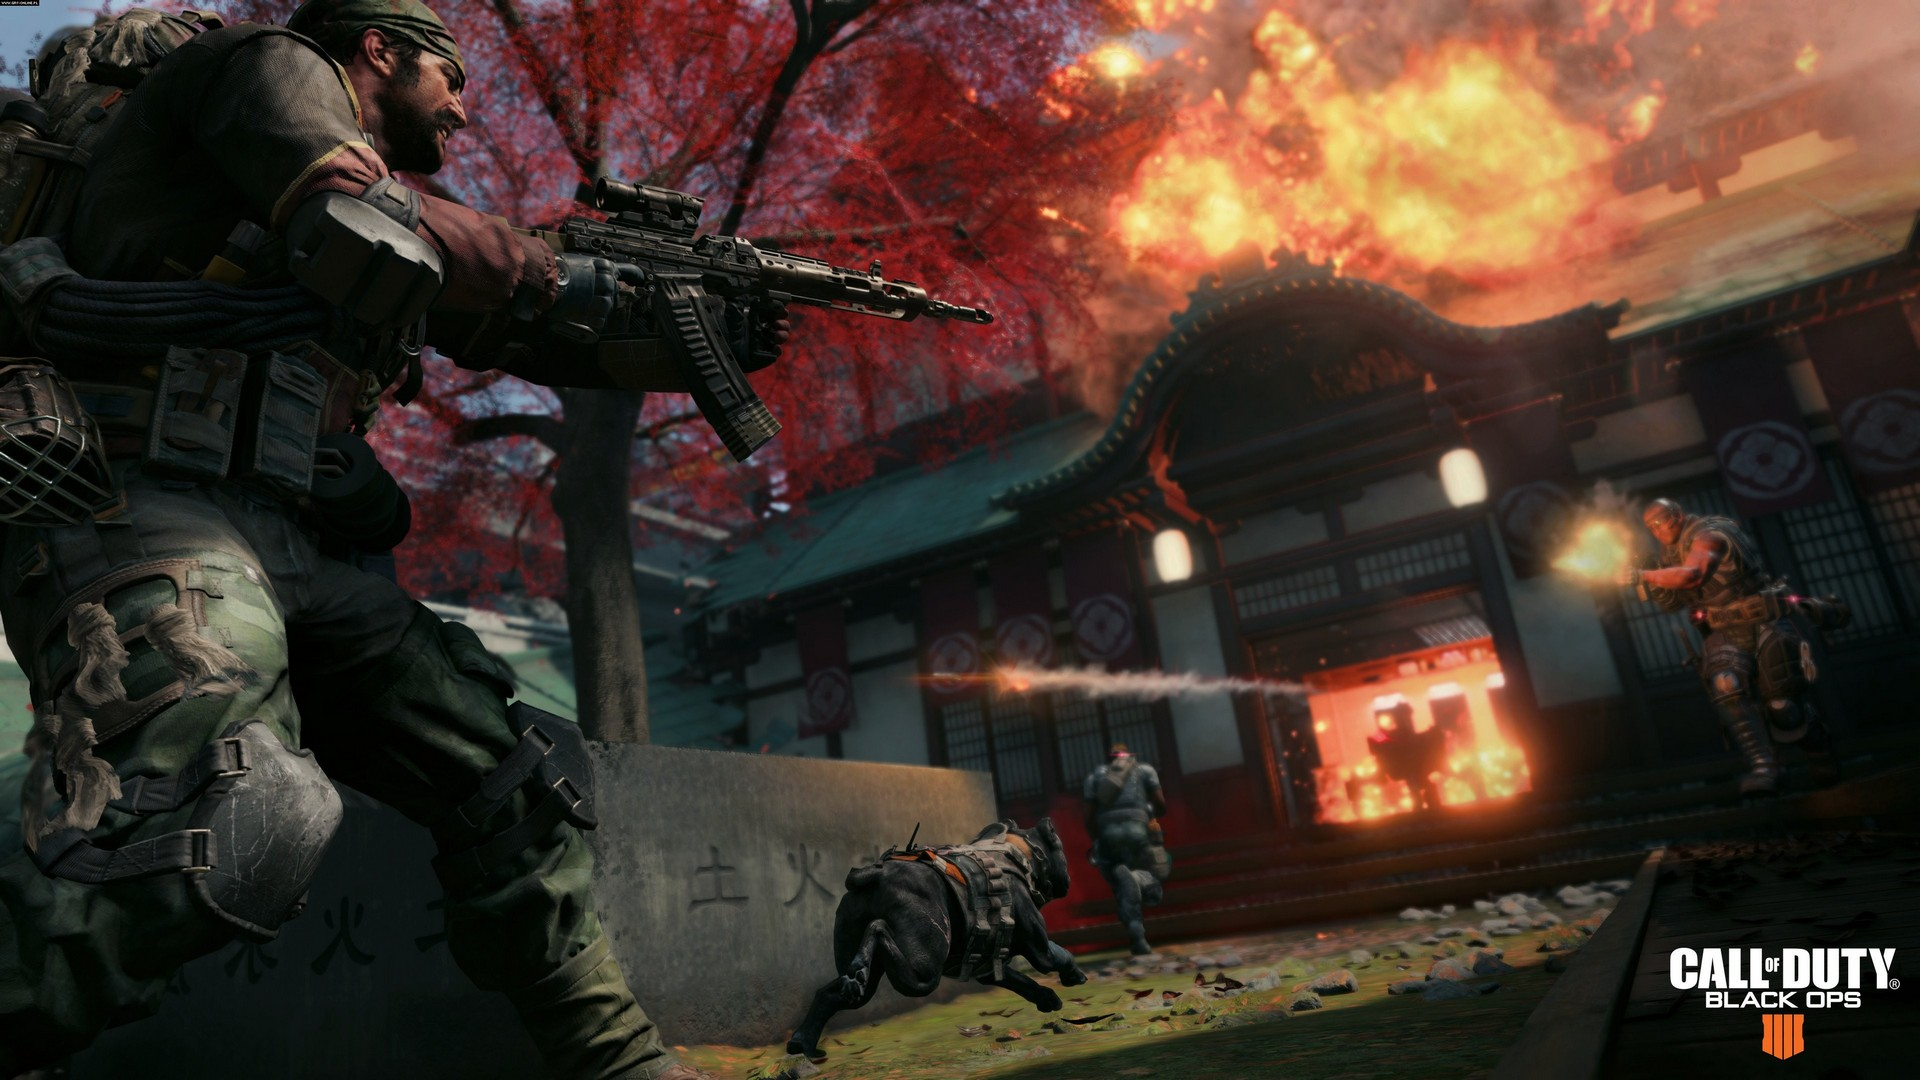 Call of Duty Black Ops 4 IIII screenshots slike